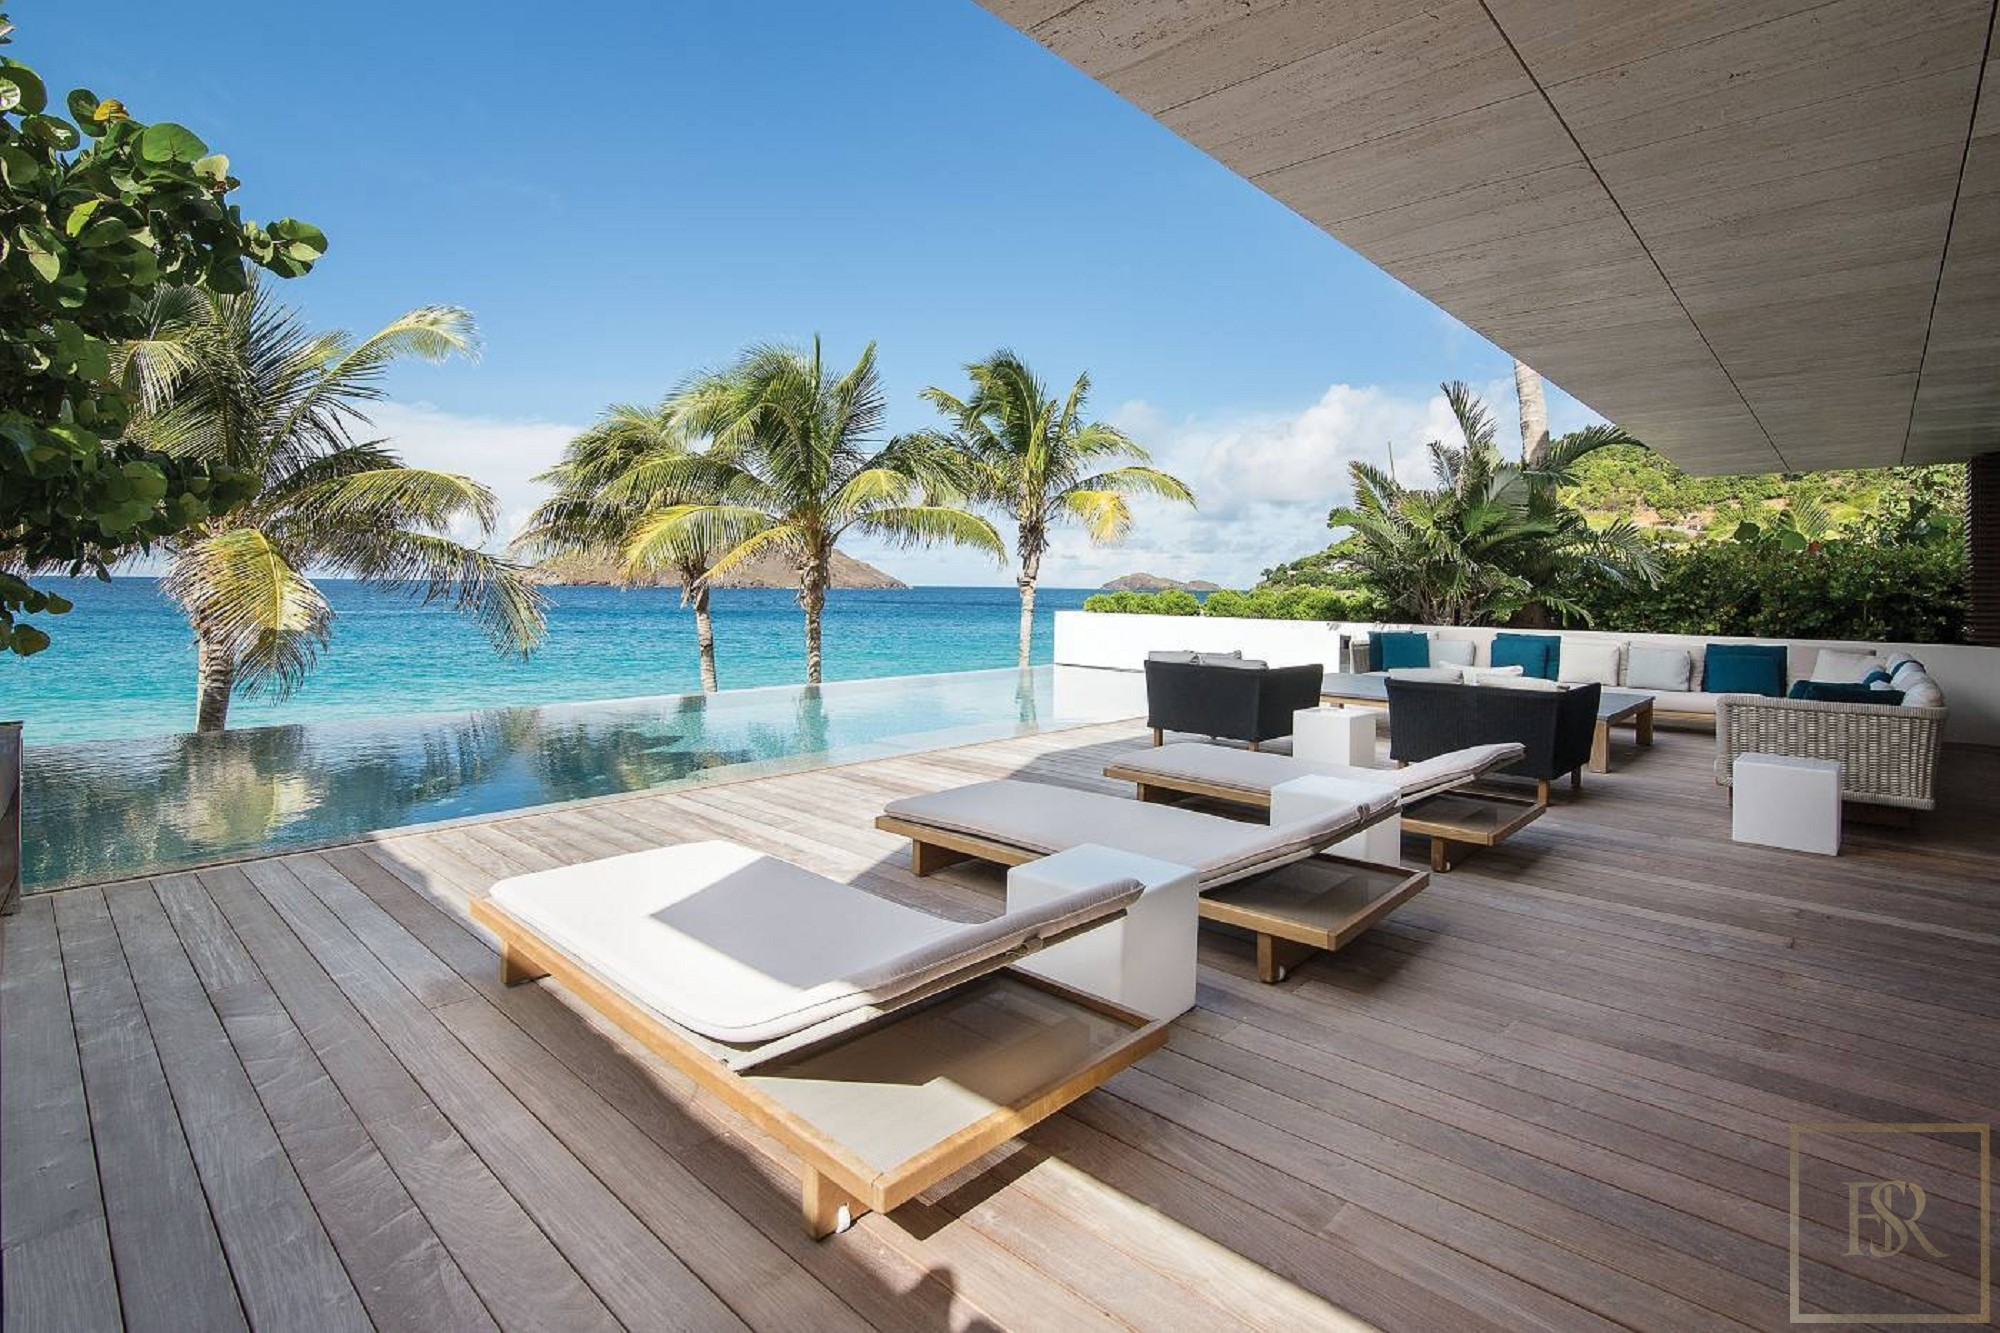 Villa Wake Up 6 BR - Flamand, St Barth / St Barts rental For Super Rich